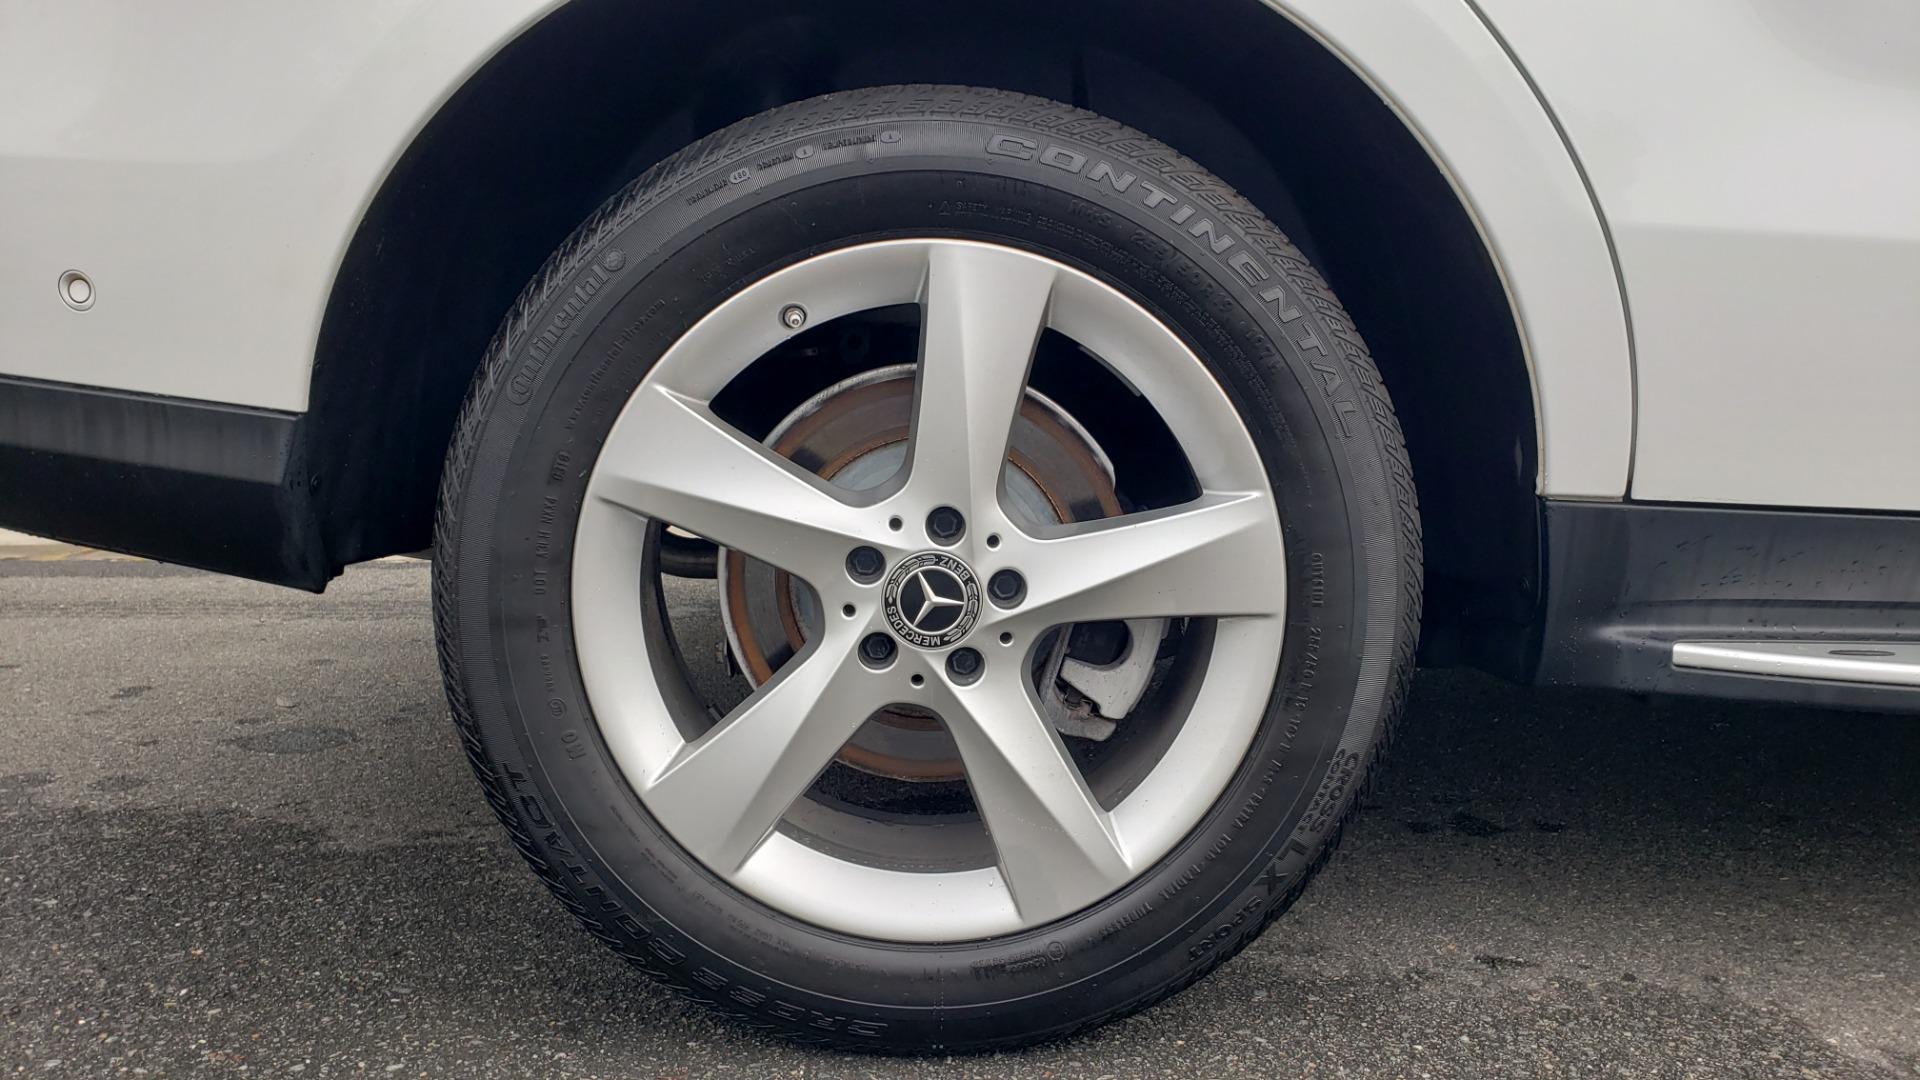 Used 2018 Mercedes-Benz GLE 350 4MATIC / PREM PKG / NAV / PARK ASST / K/H SND / HITCH / REARVIEW for sale $40,801 at Formula Imports in Charlotte NC 28227 84